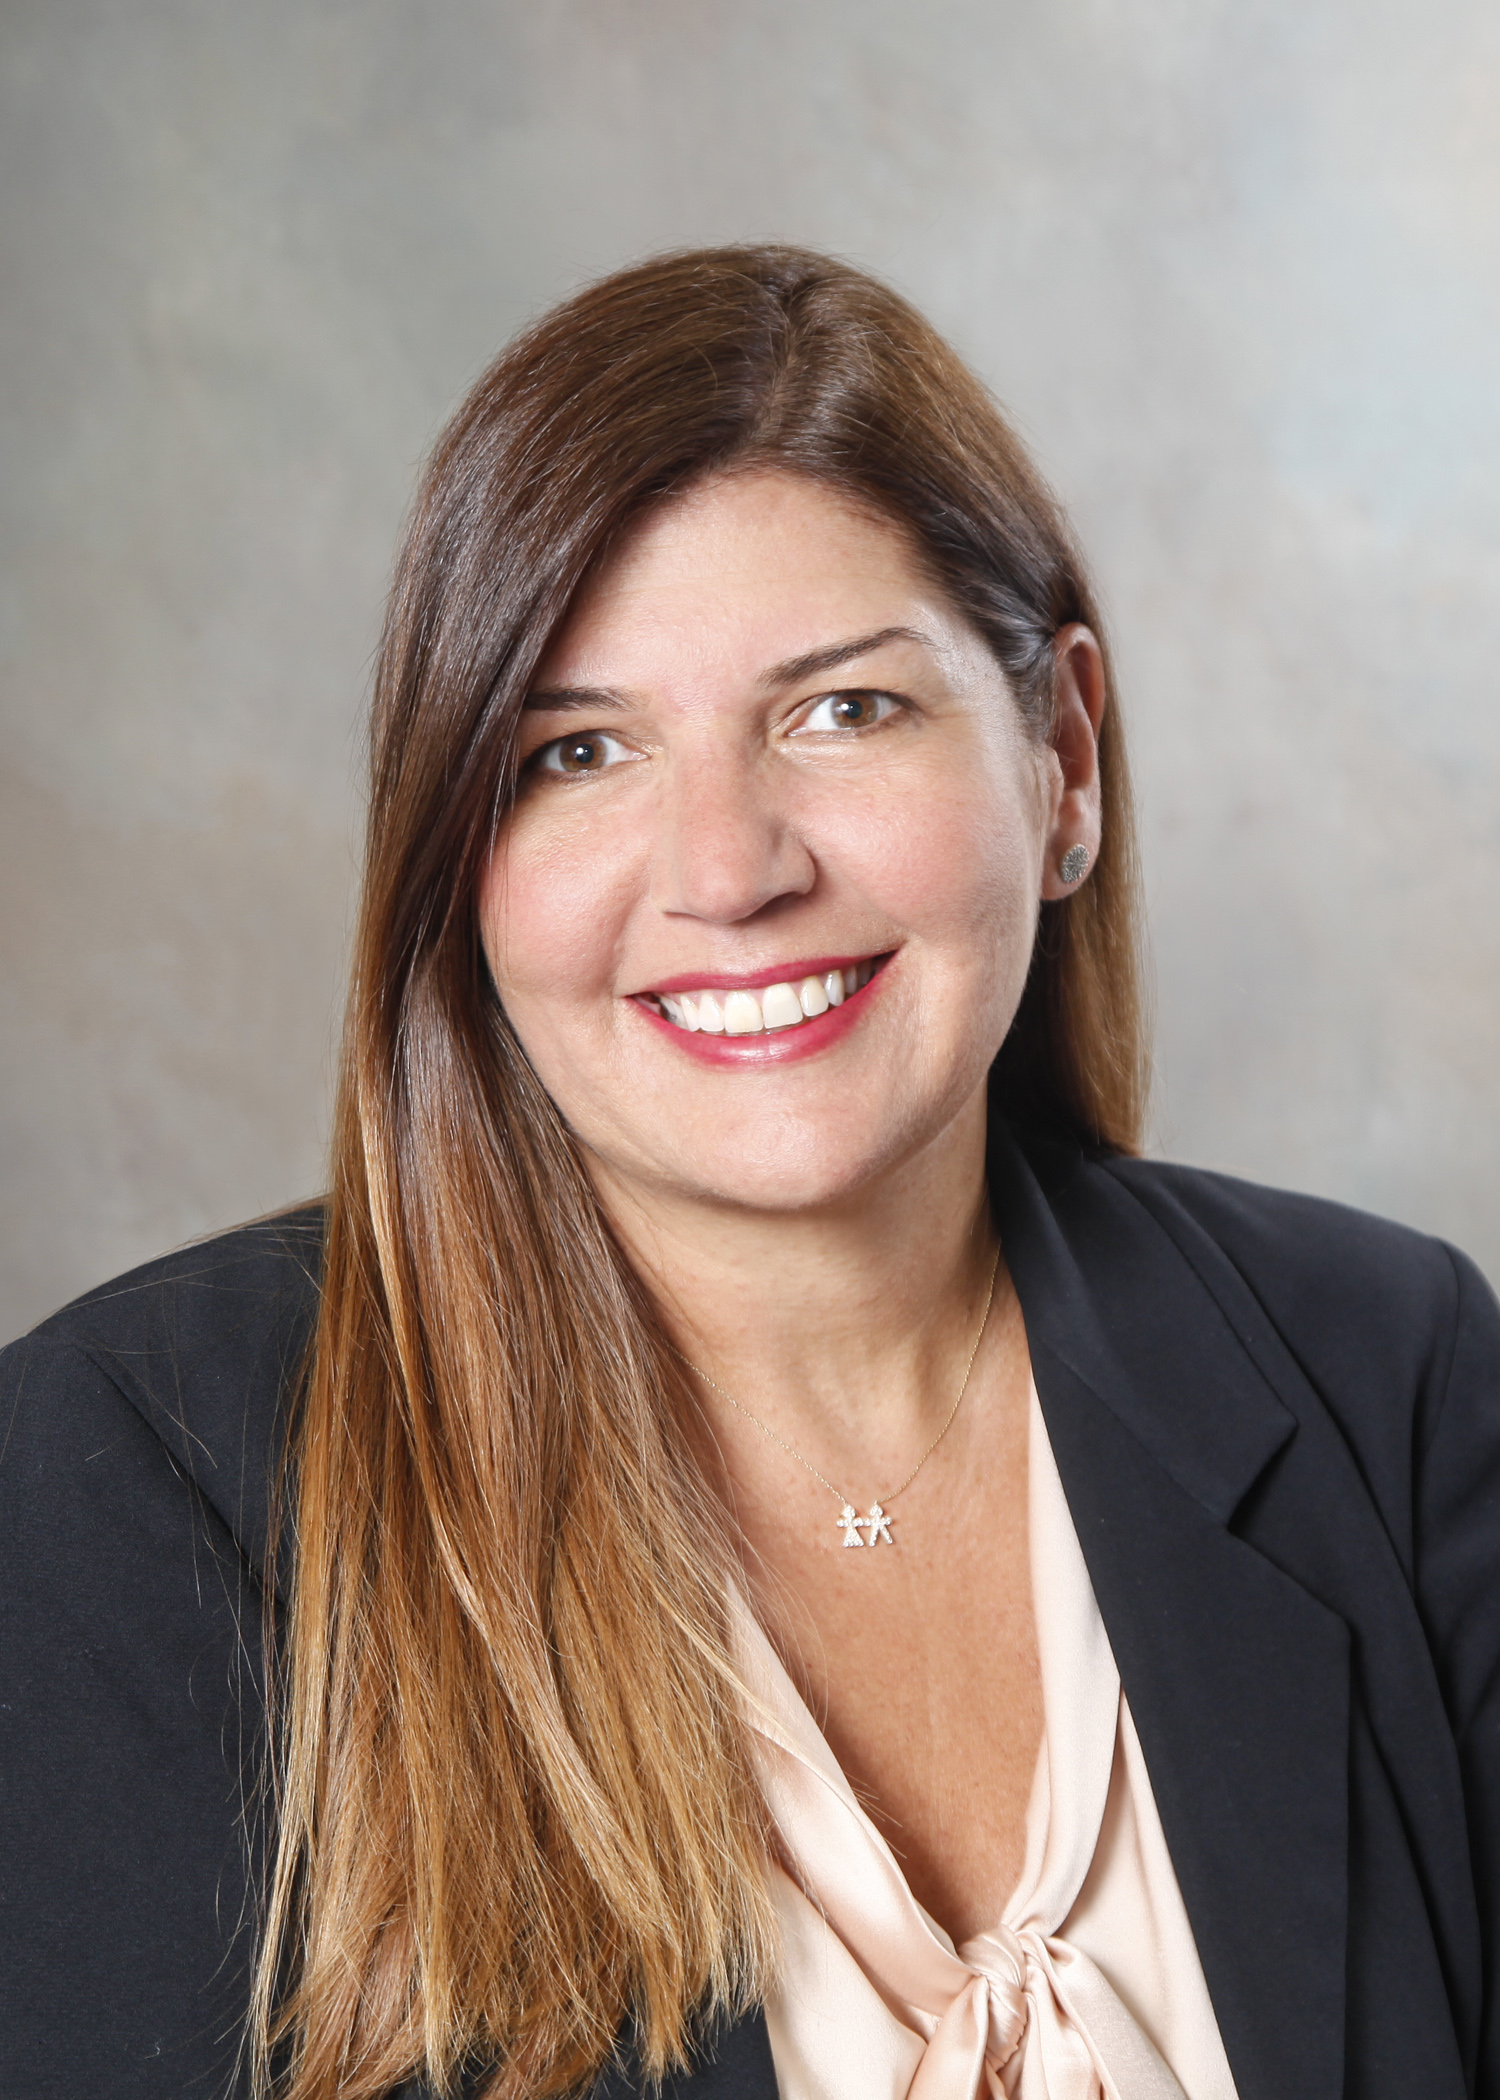 Miami Today otorga a la Dra. Rosany Alvarez, profesora de Matemáticas del Miami Dade College, la Medalla de Plata 2015